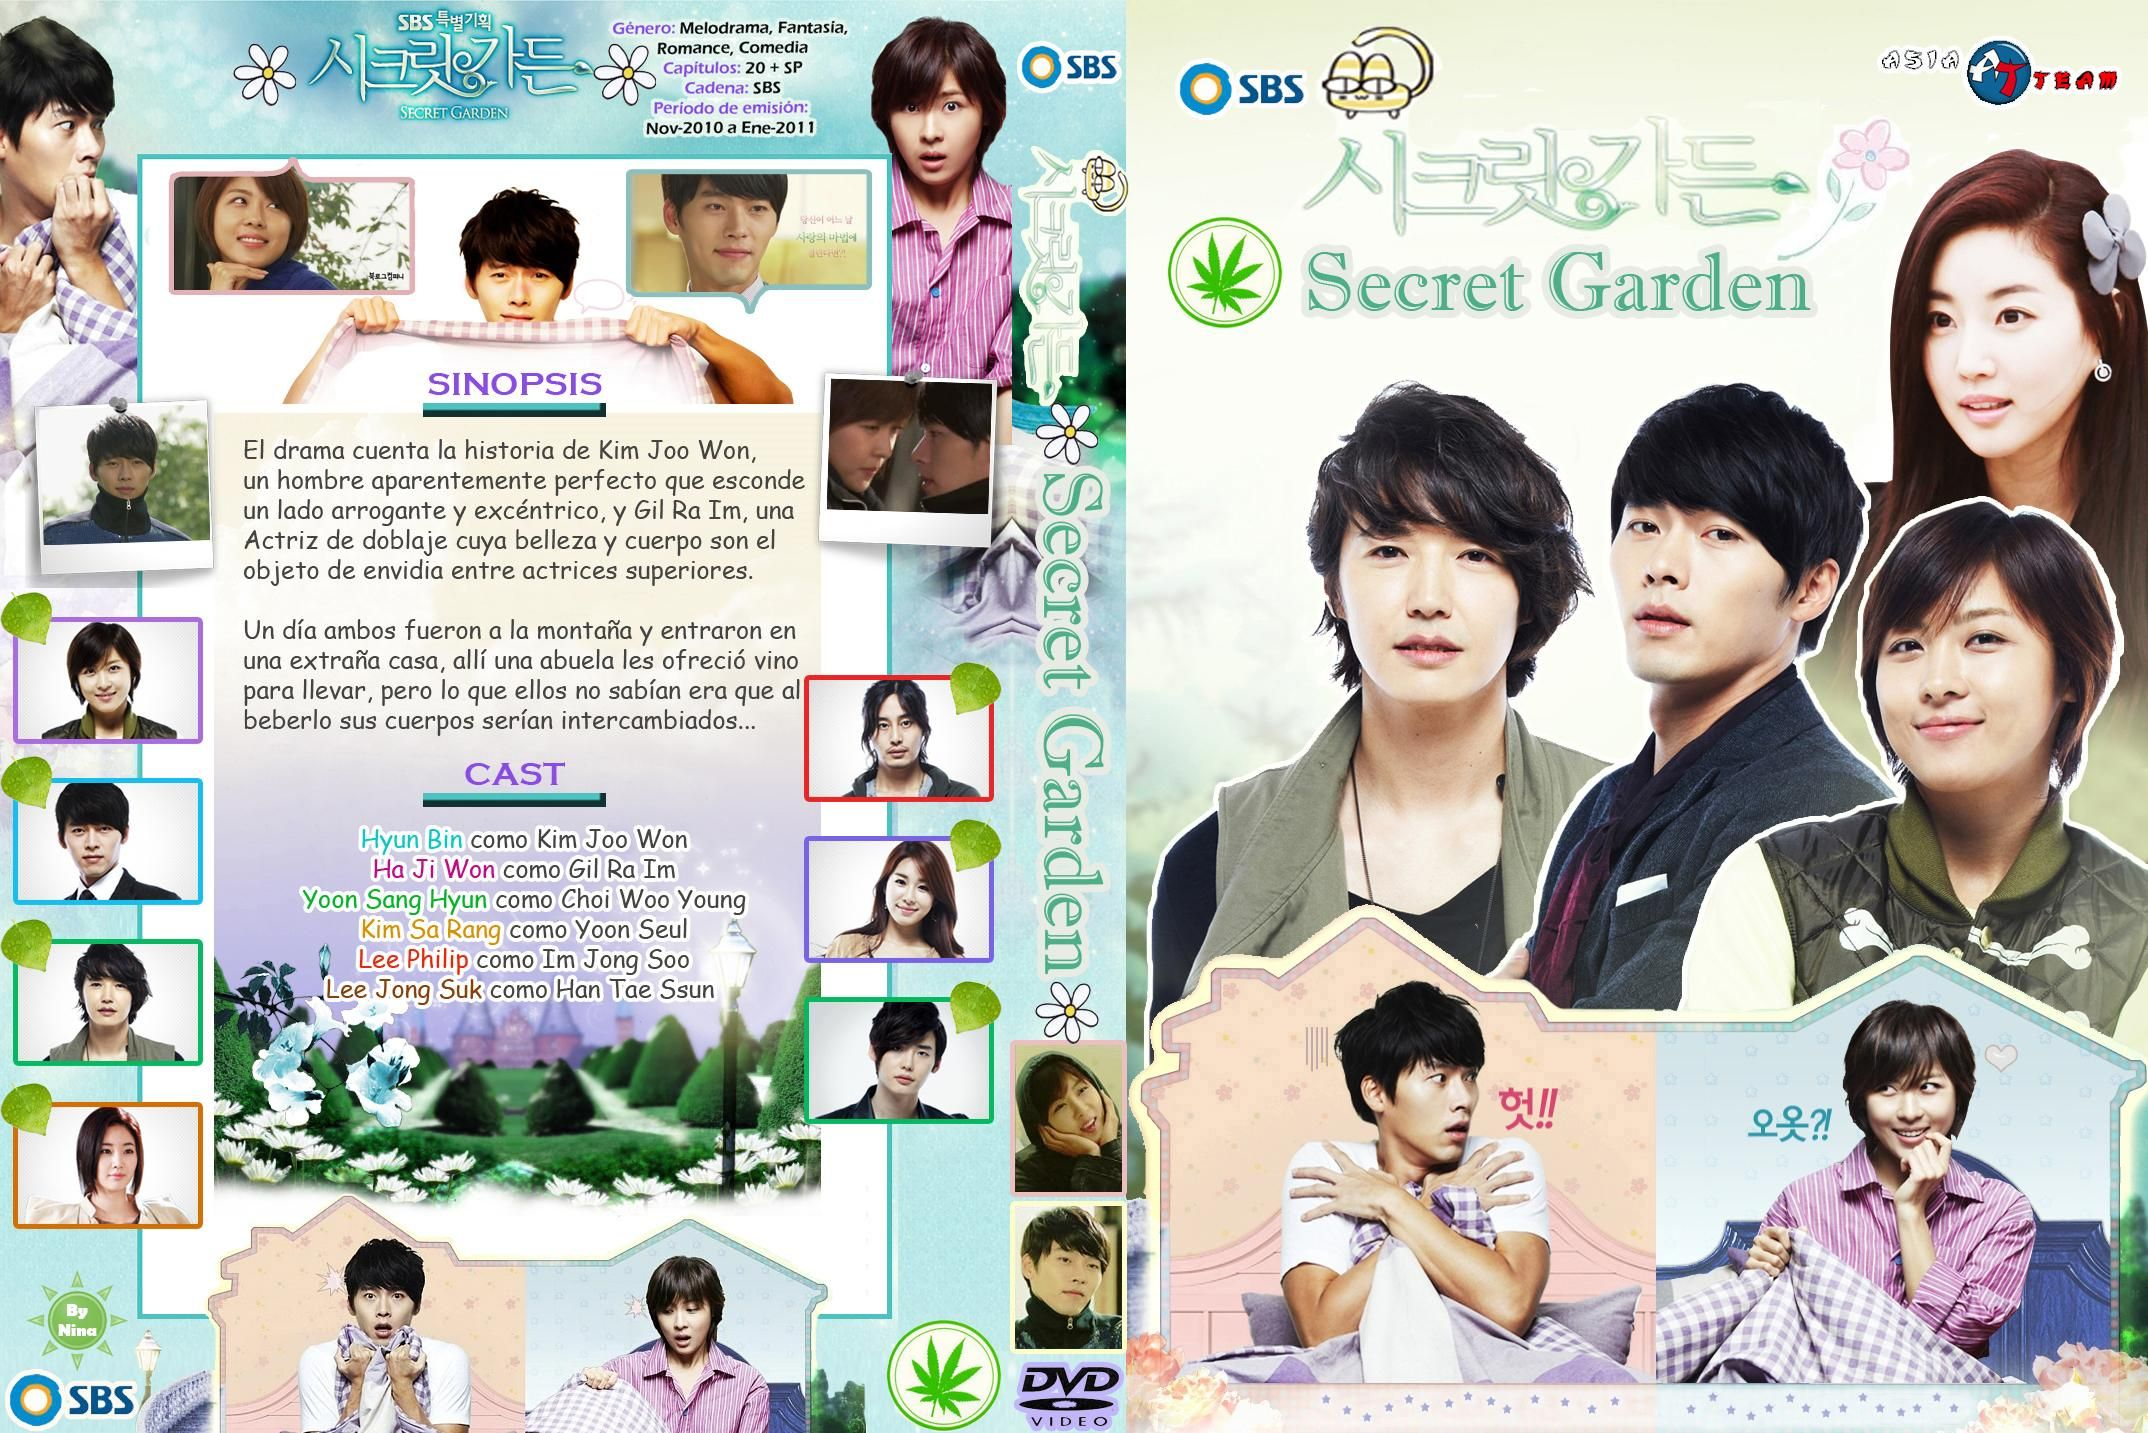 T tulo original sikeurit gadeun t tulo ingl s for Banda sonora de el jardin secreto